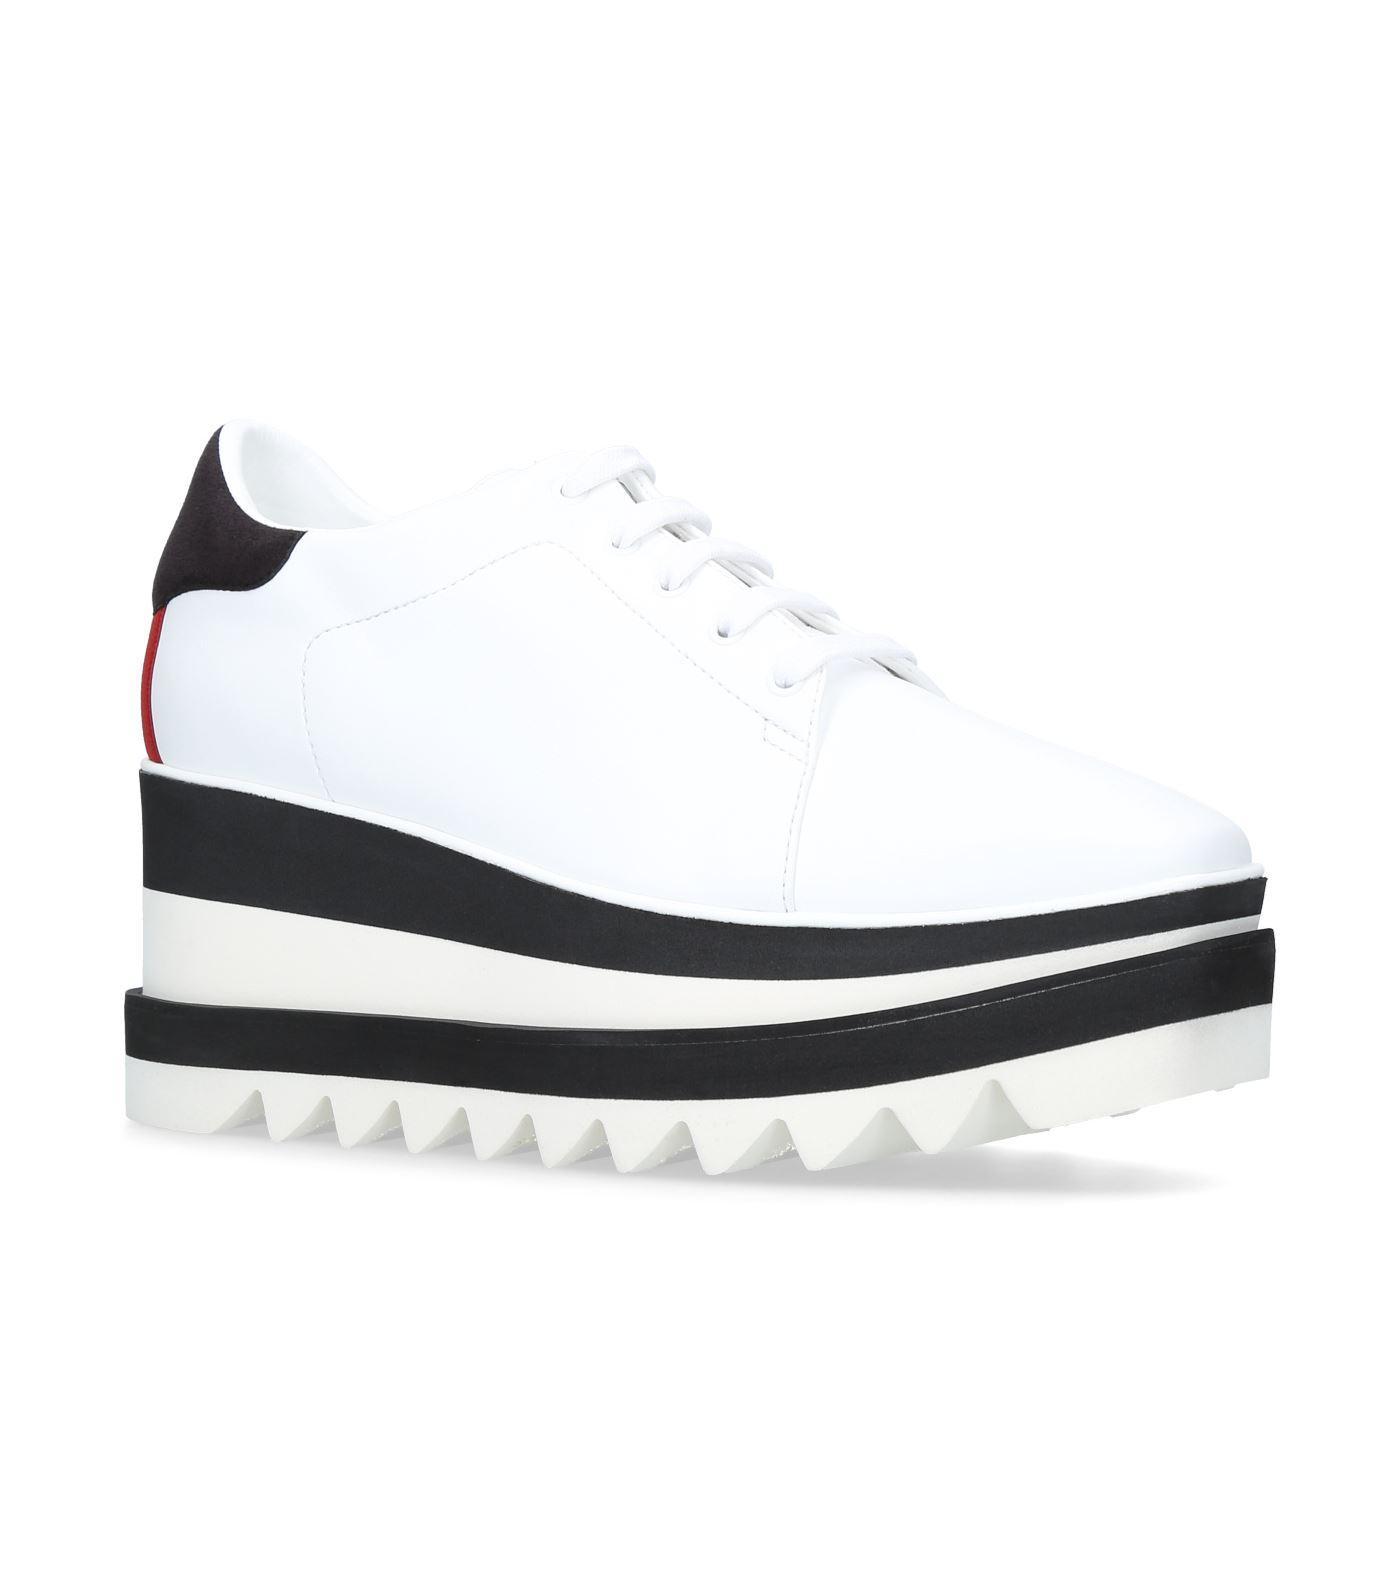 e6044a23849 Stella Mccartney Elyse Platform Sneakers In White